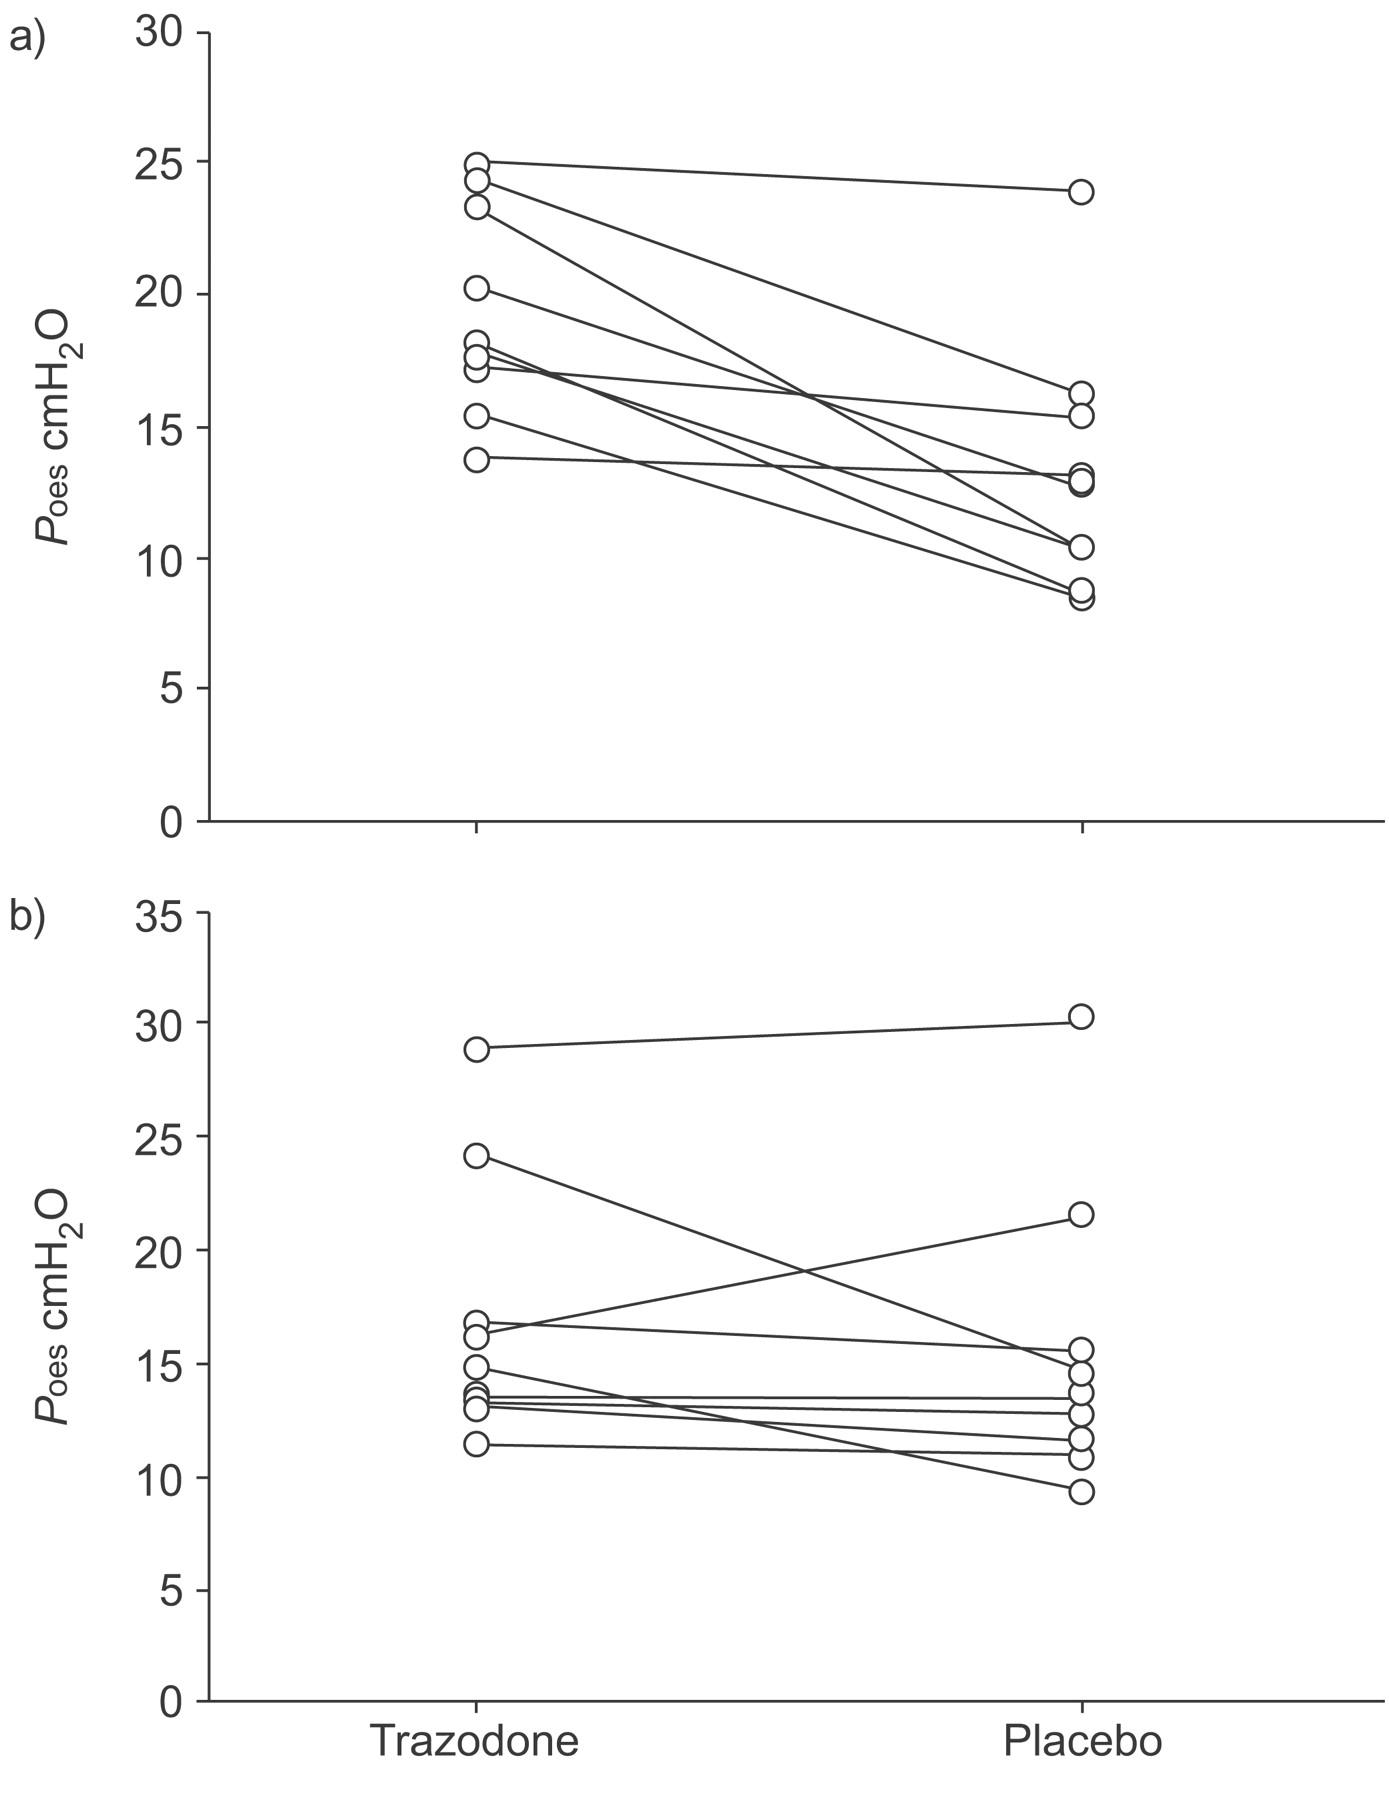 Trazodone increases arousal threshold in obstructive sleep apnoea